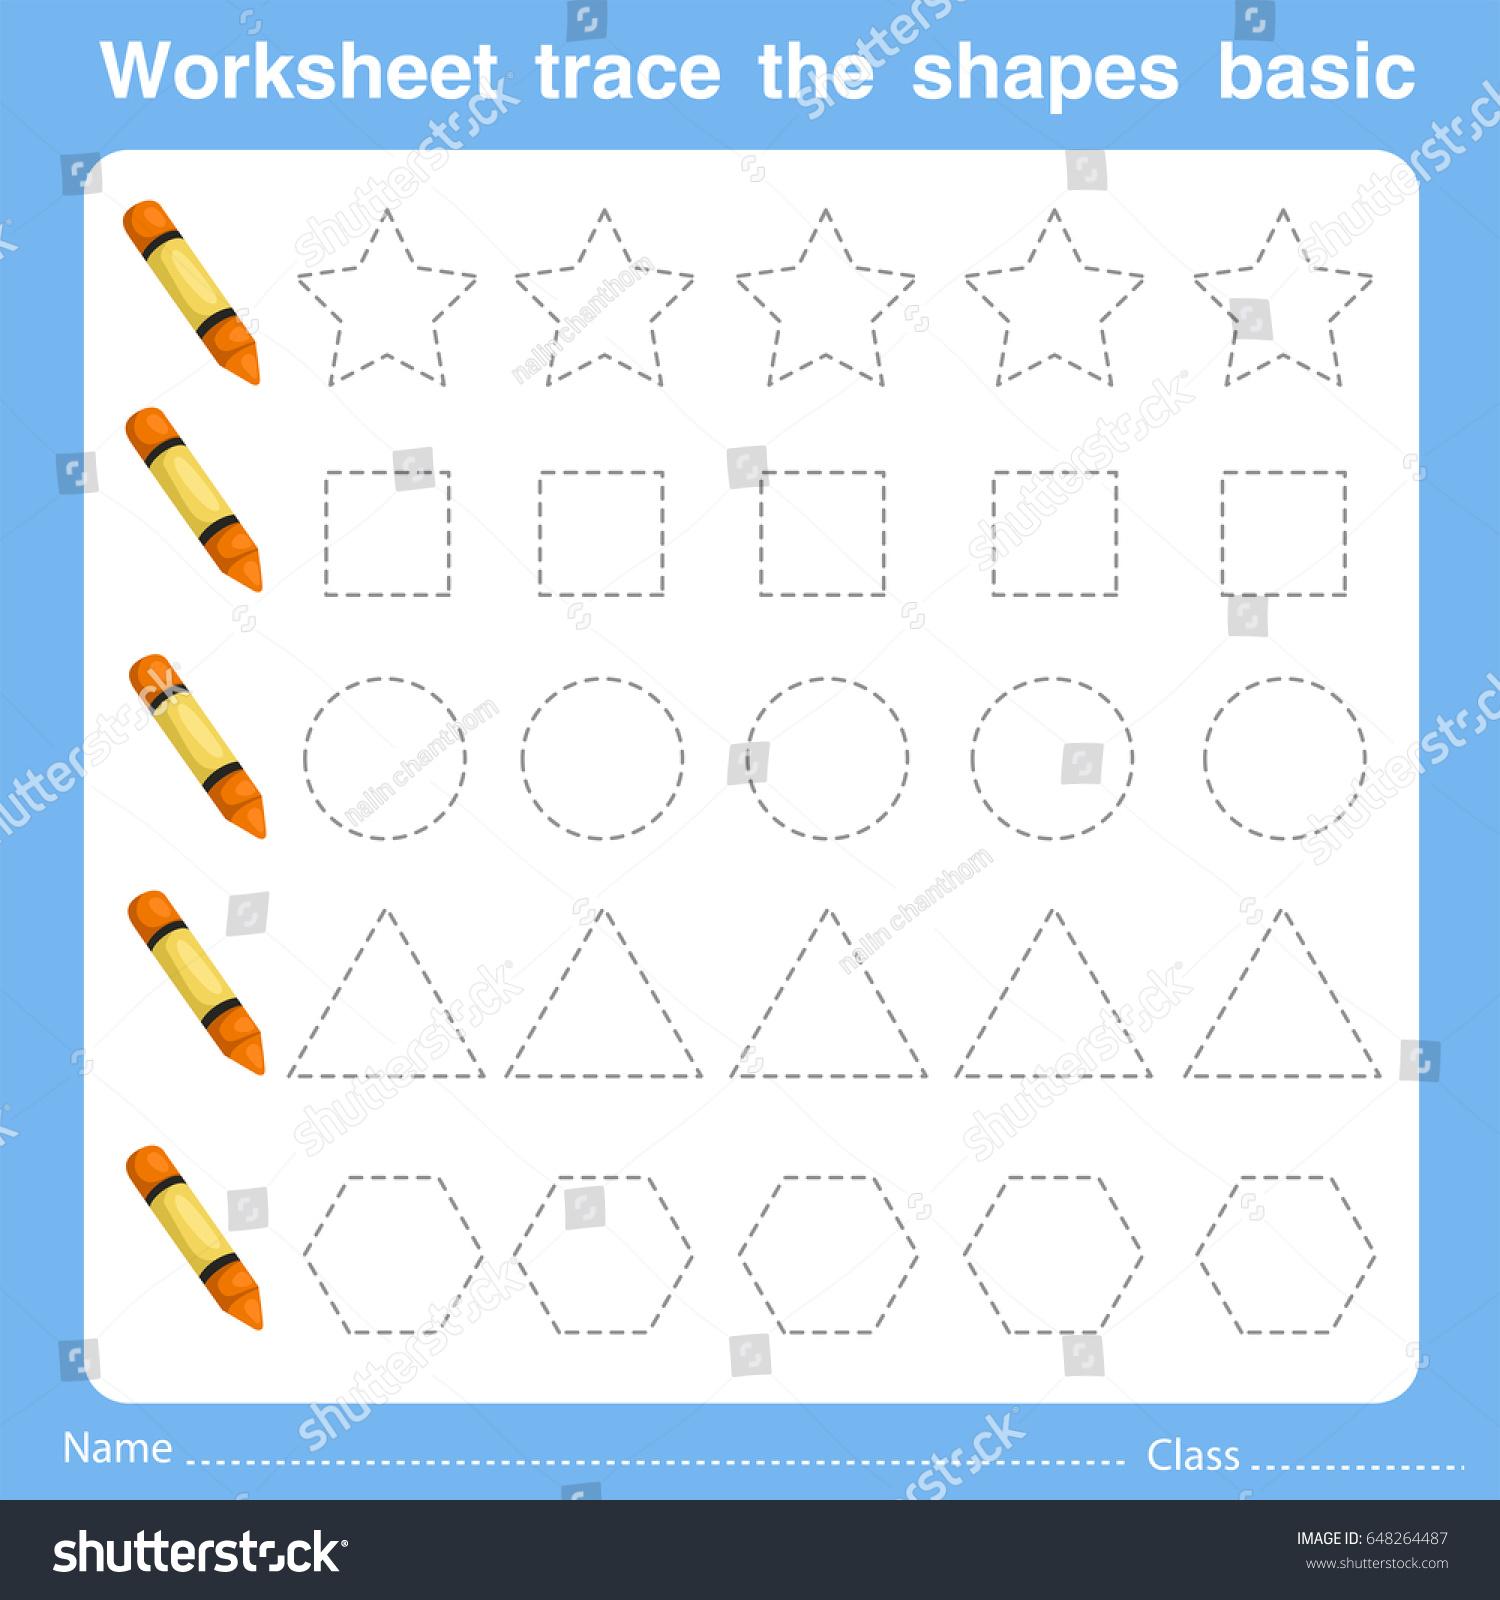 Illustrator Worksheet Trace Shapes Basic Three Stock Vector